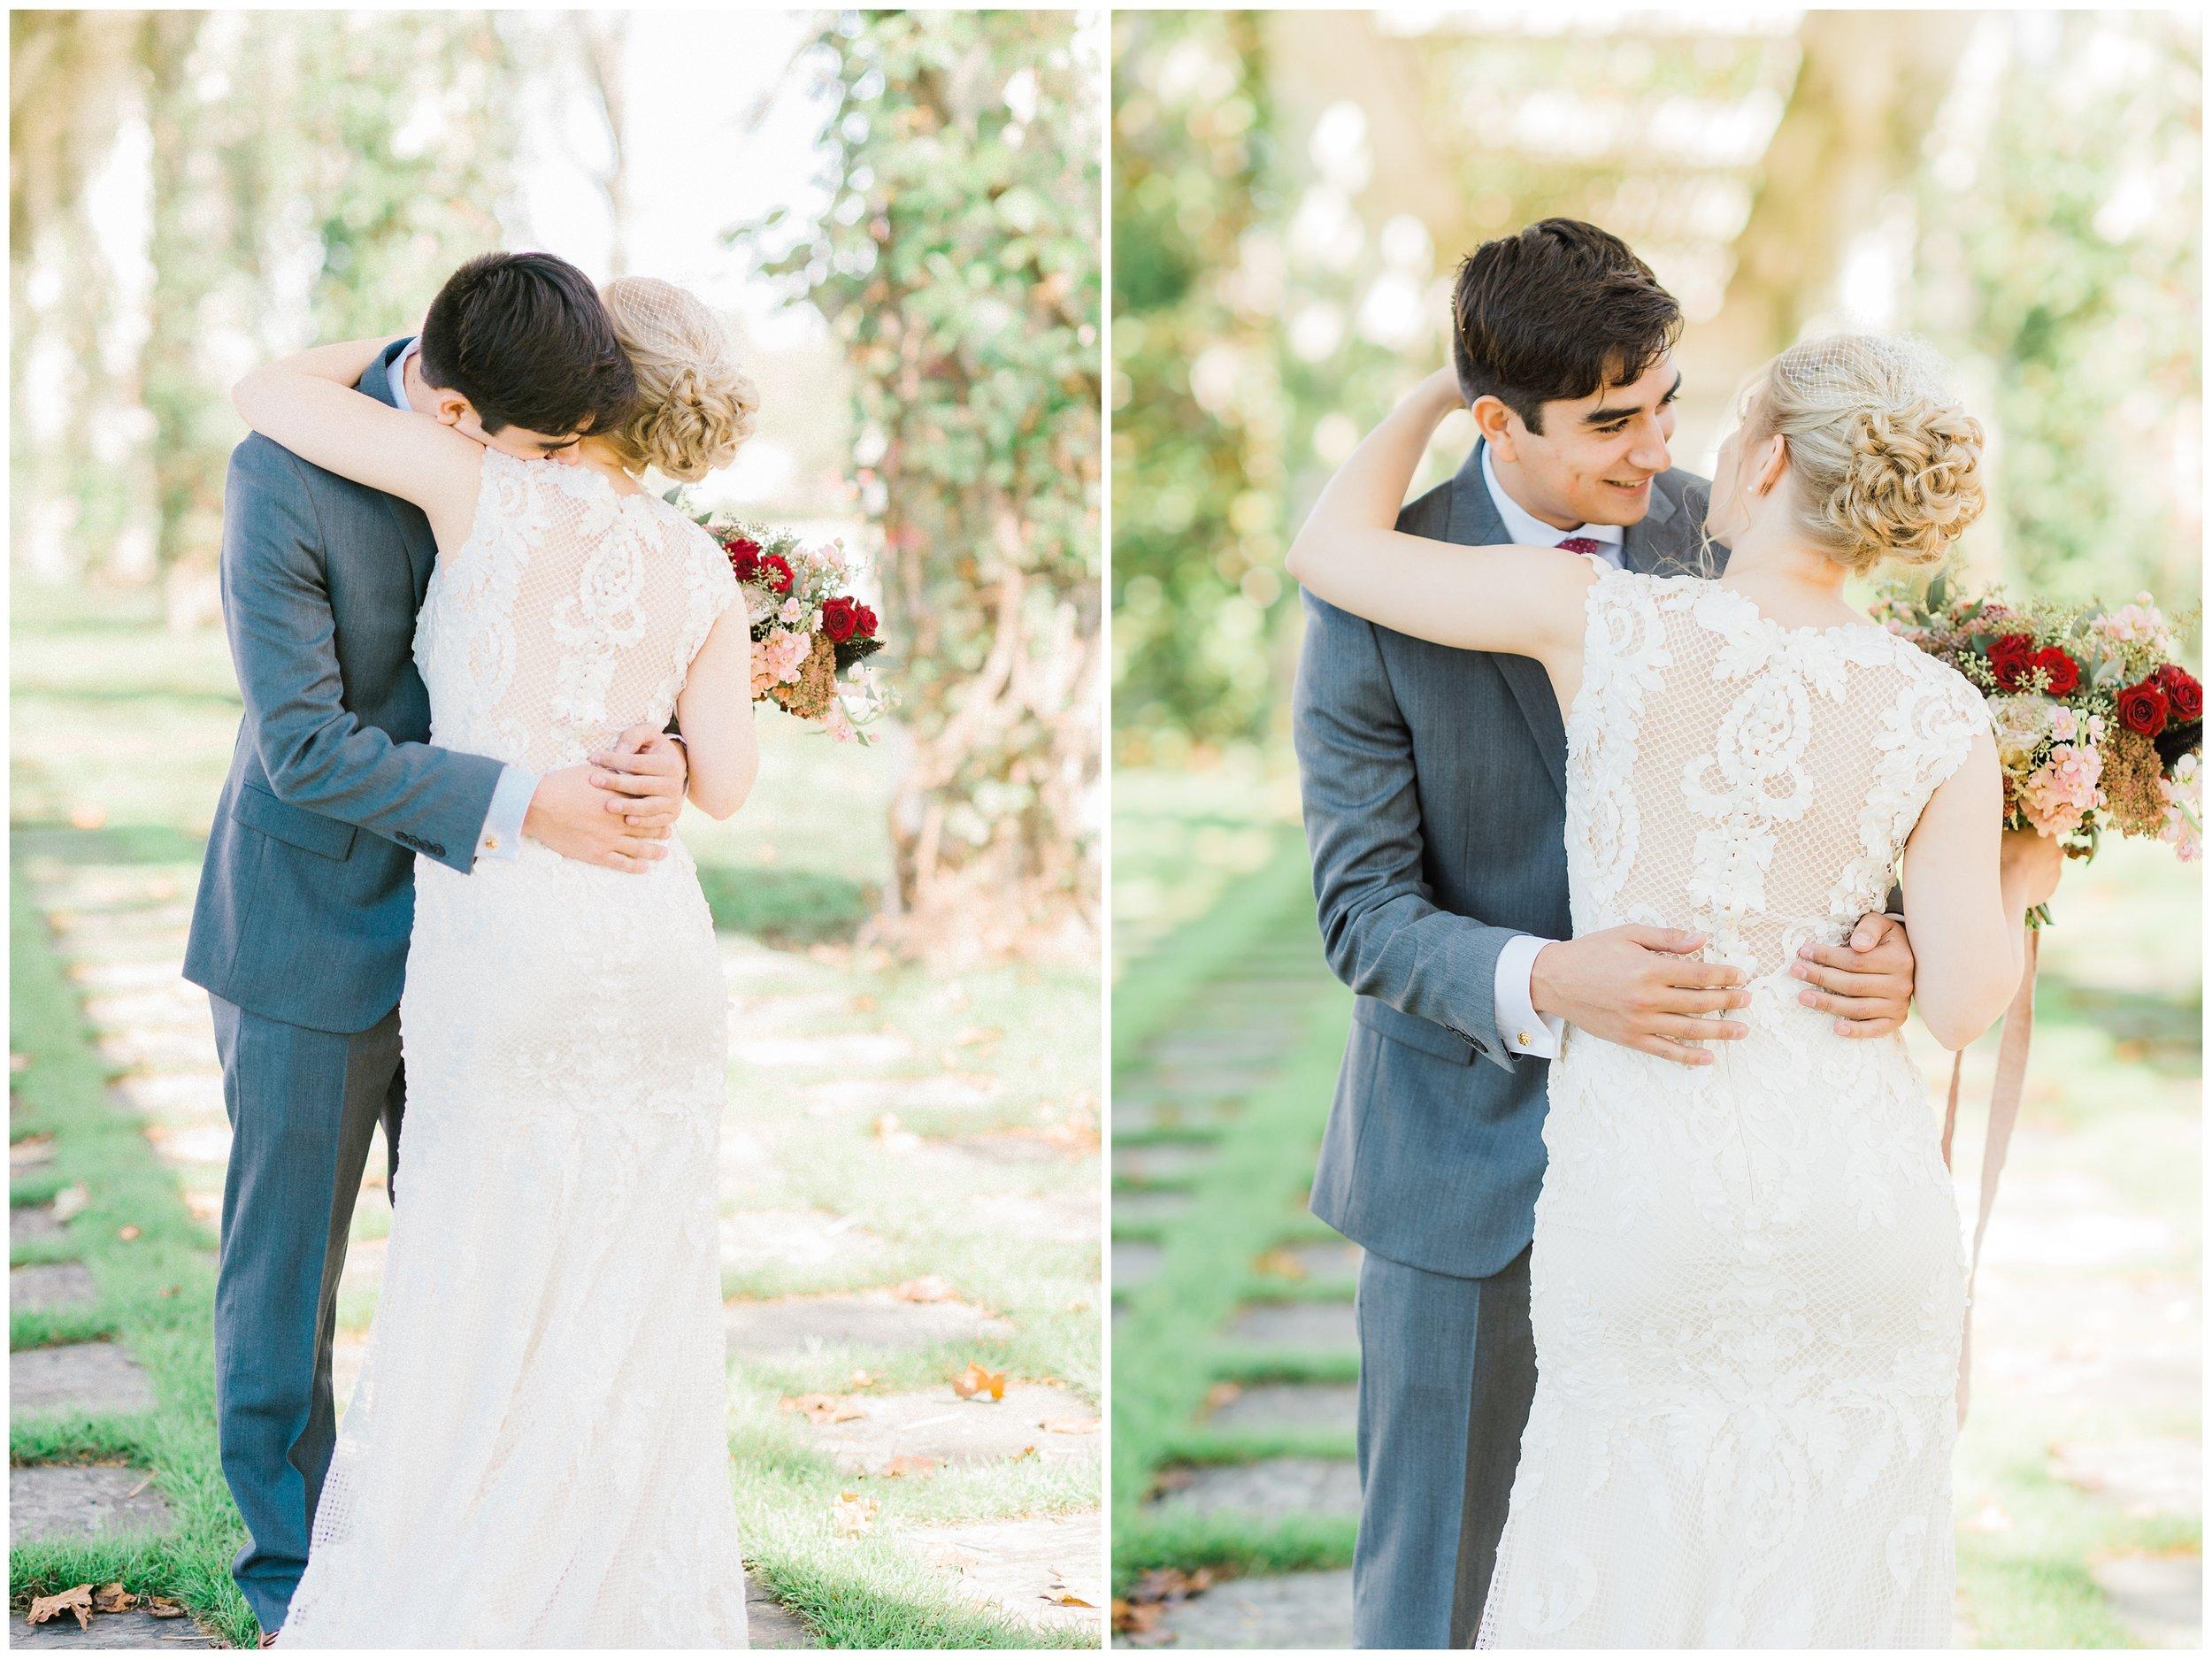 Rebecca_Shehorn_Photography_Indianapolis_Wedding_Photographer_7309.jpg